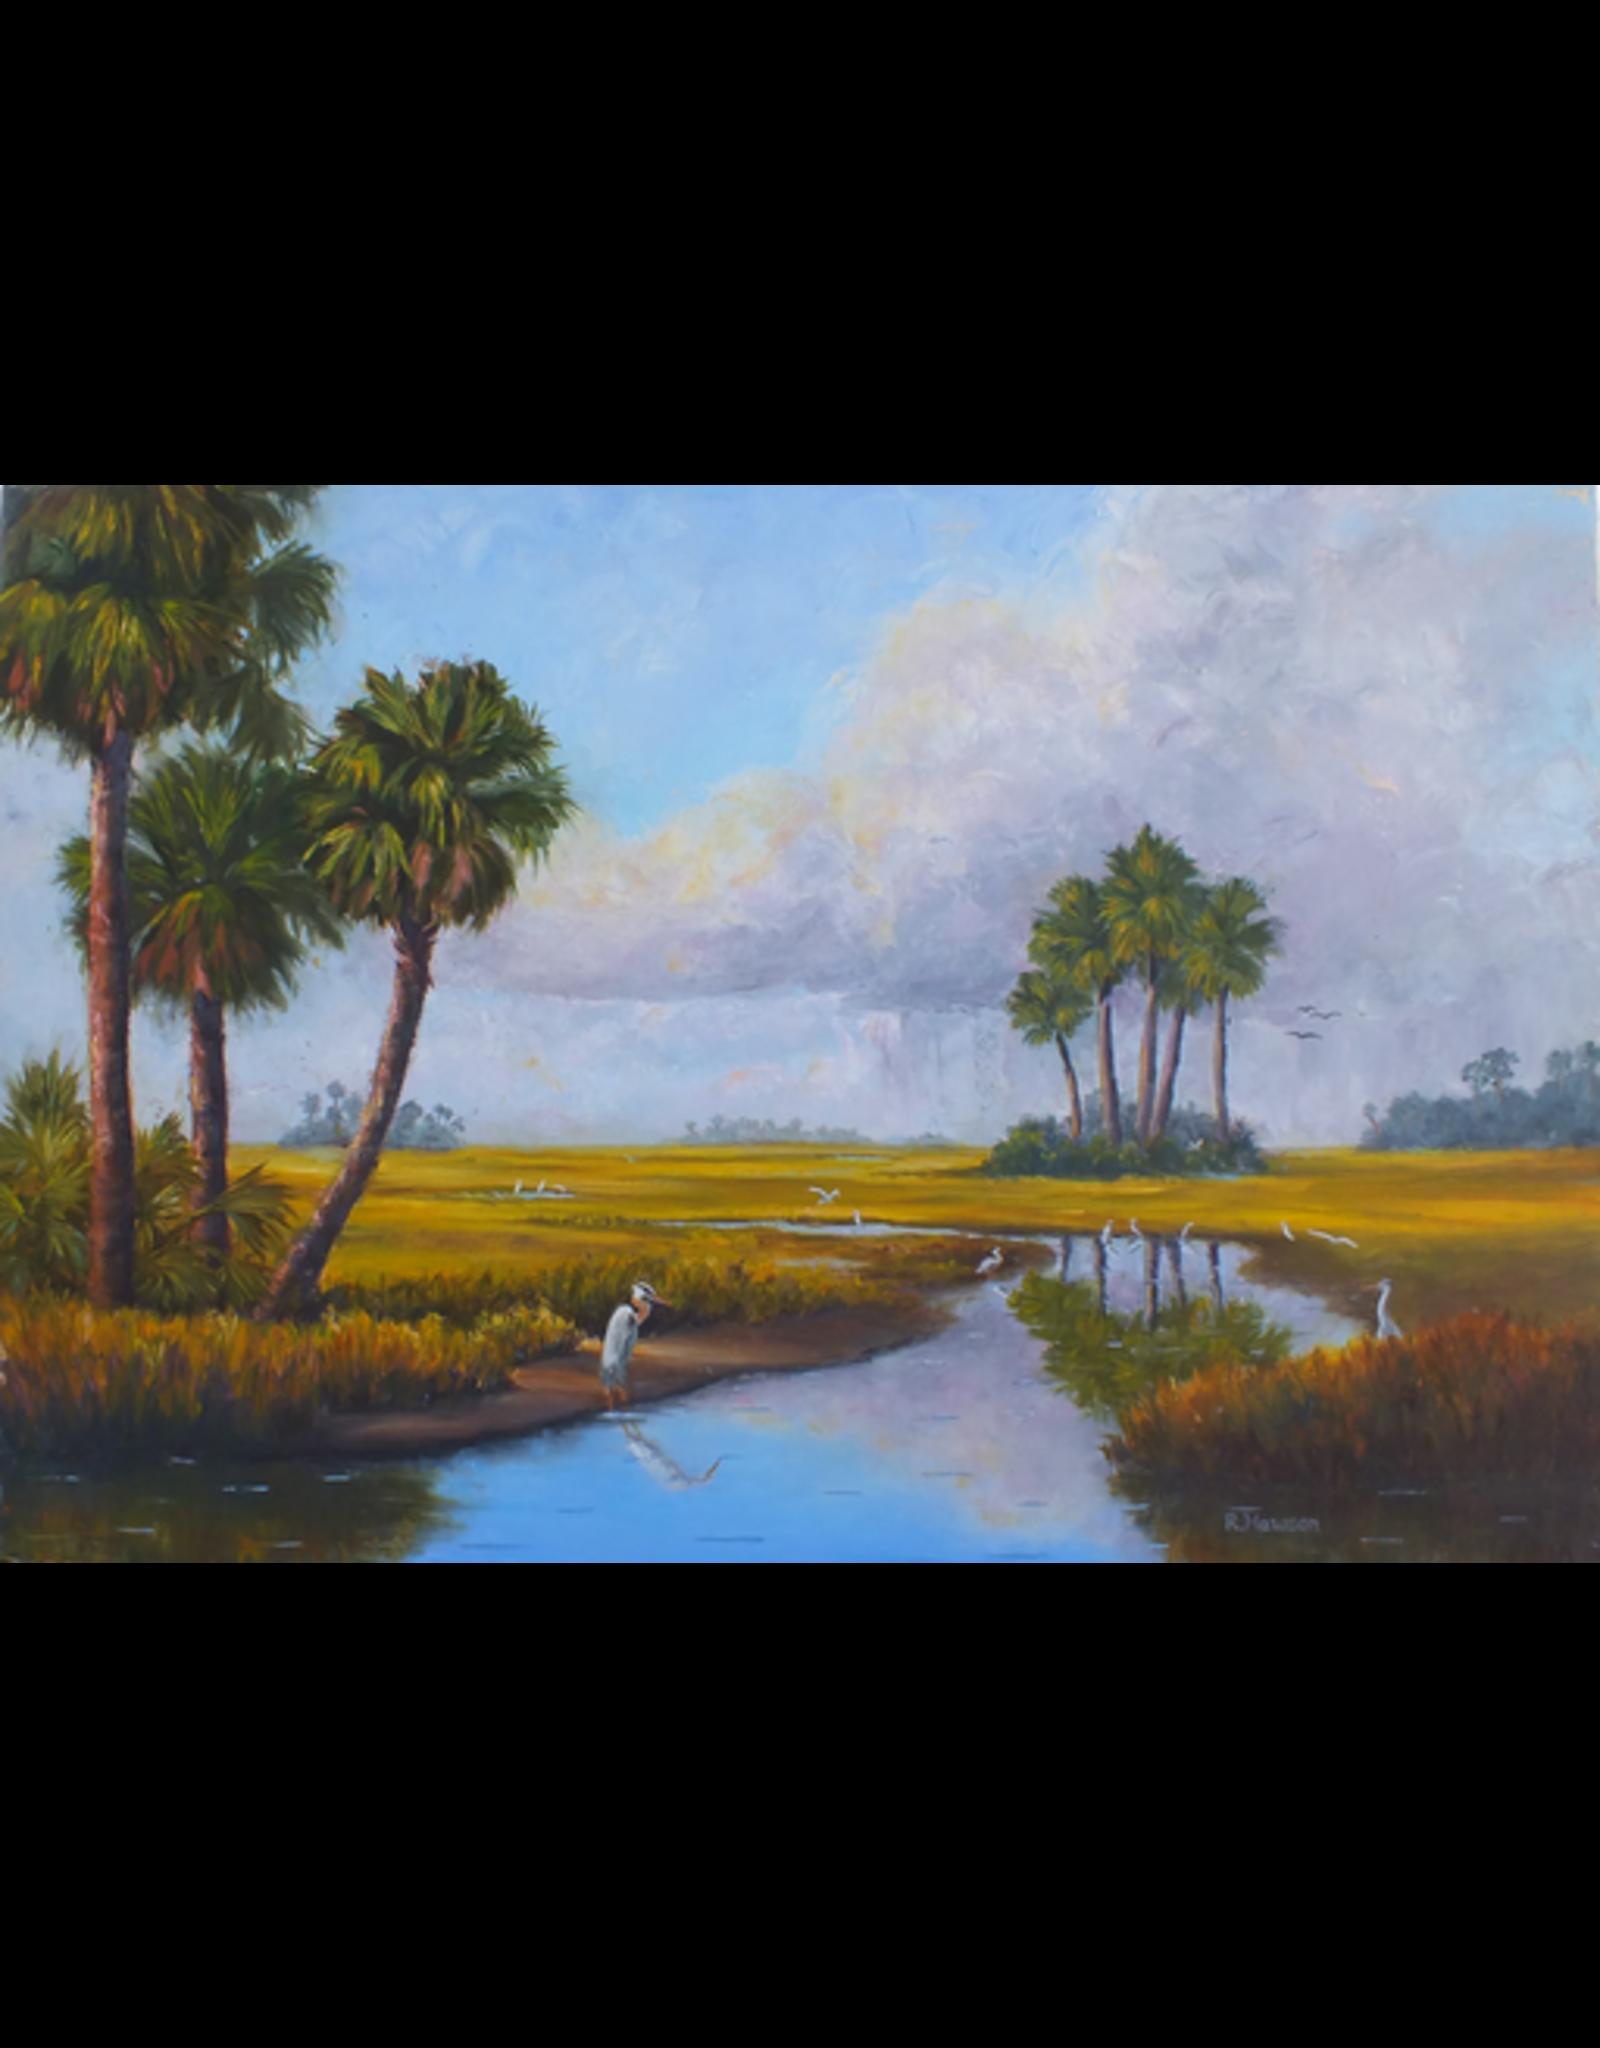 Ruthann Hewson Savannah Summer (Print, Matted, 11x14)